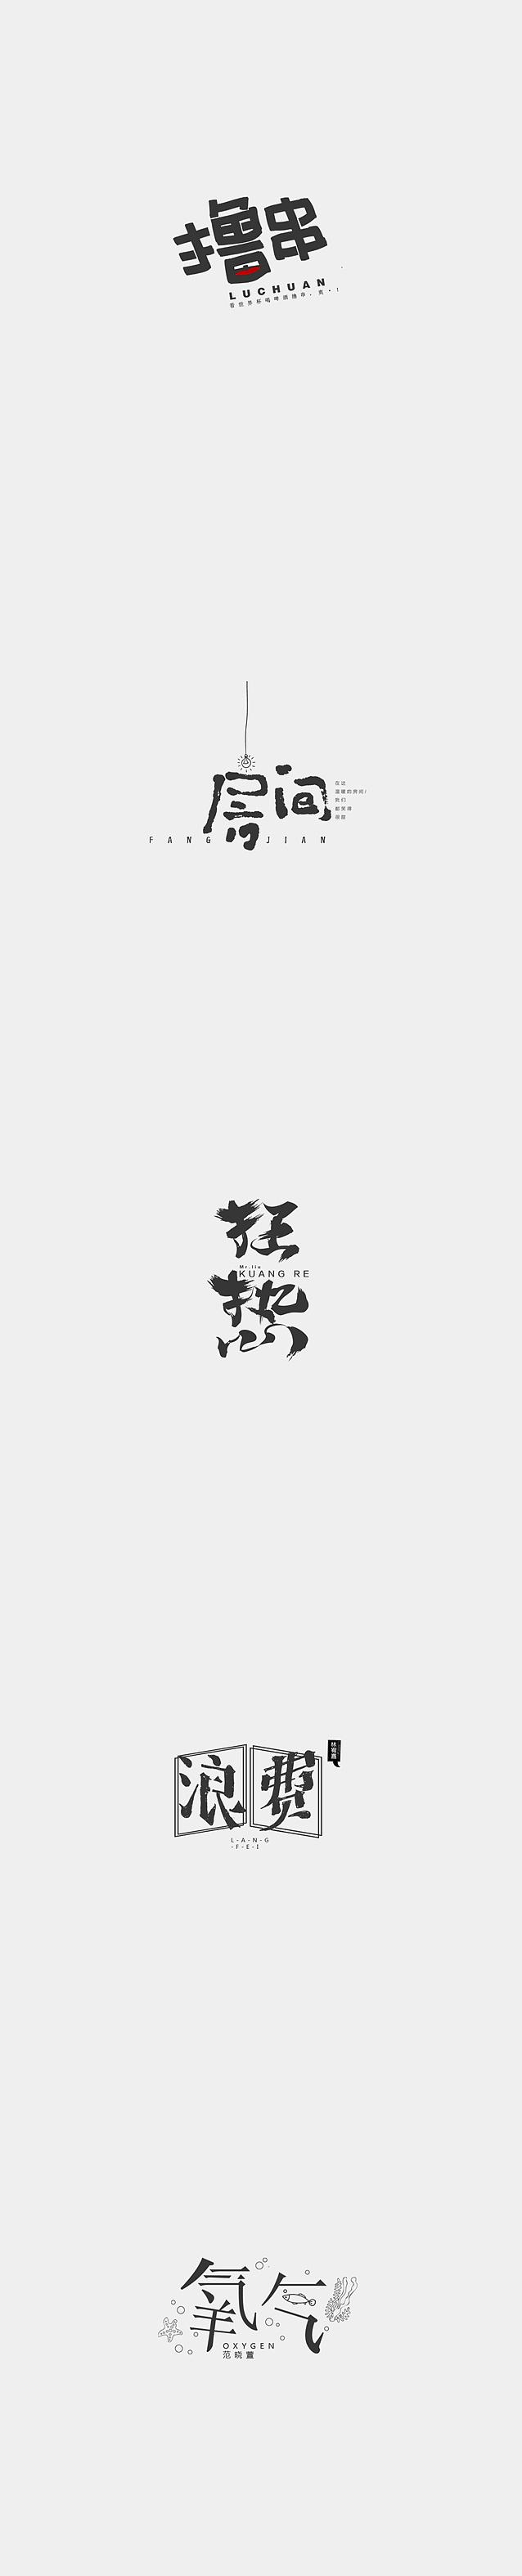 7P Creative Chinese font logo design scheme #.1052